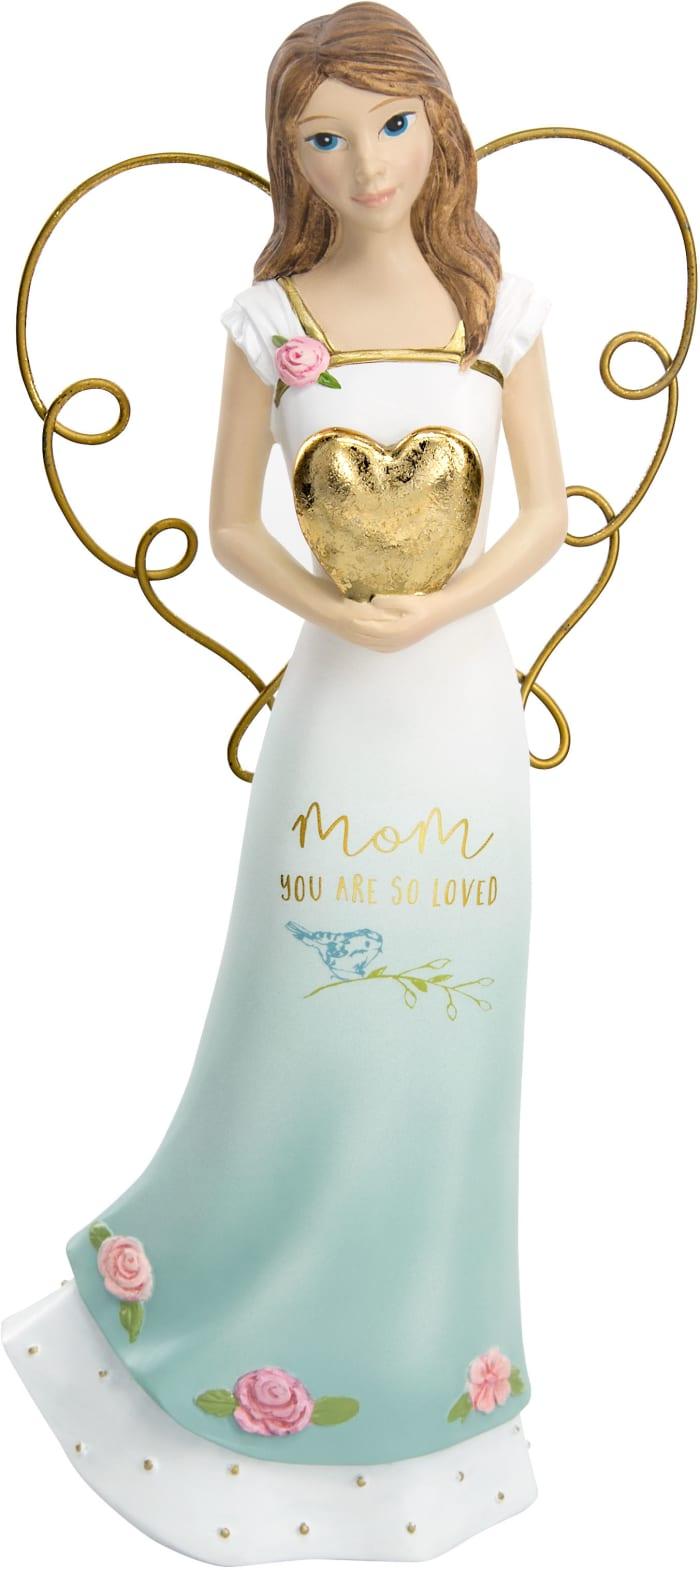 Mom - Angel Holding a Heart